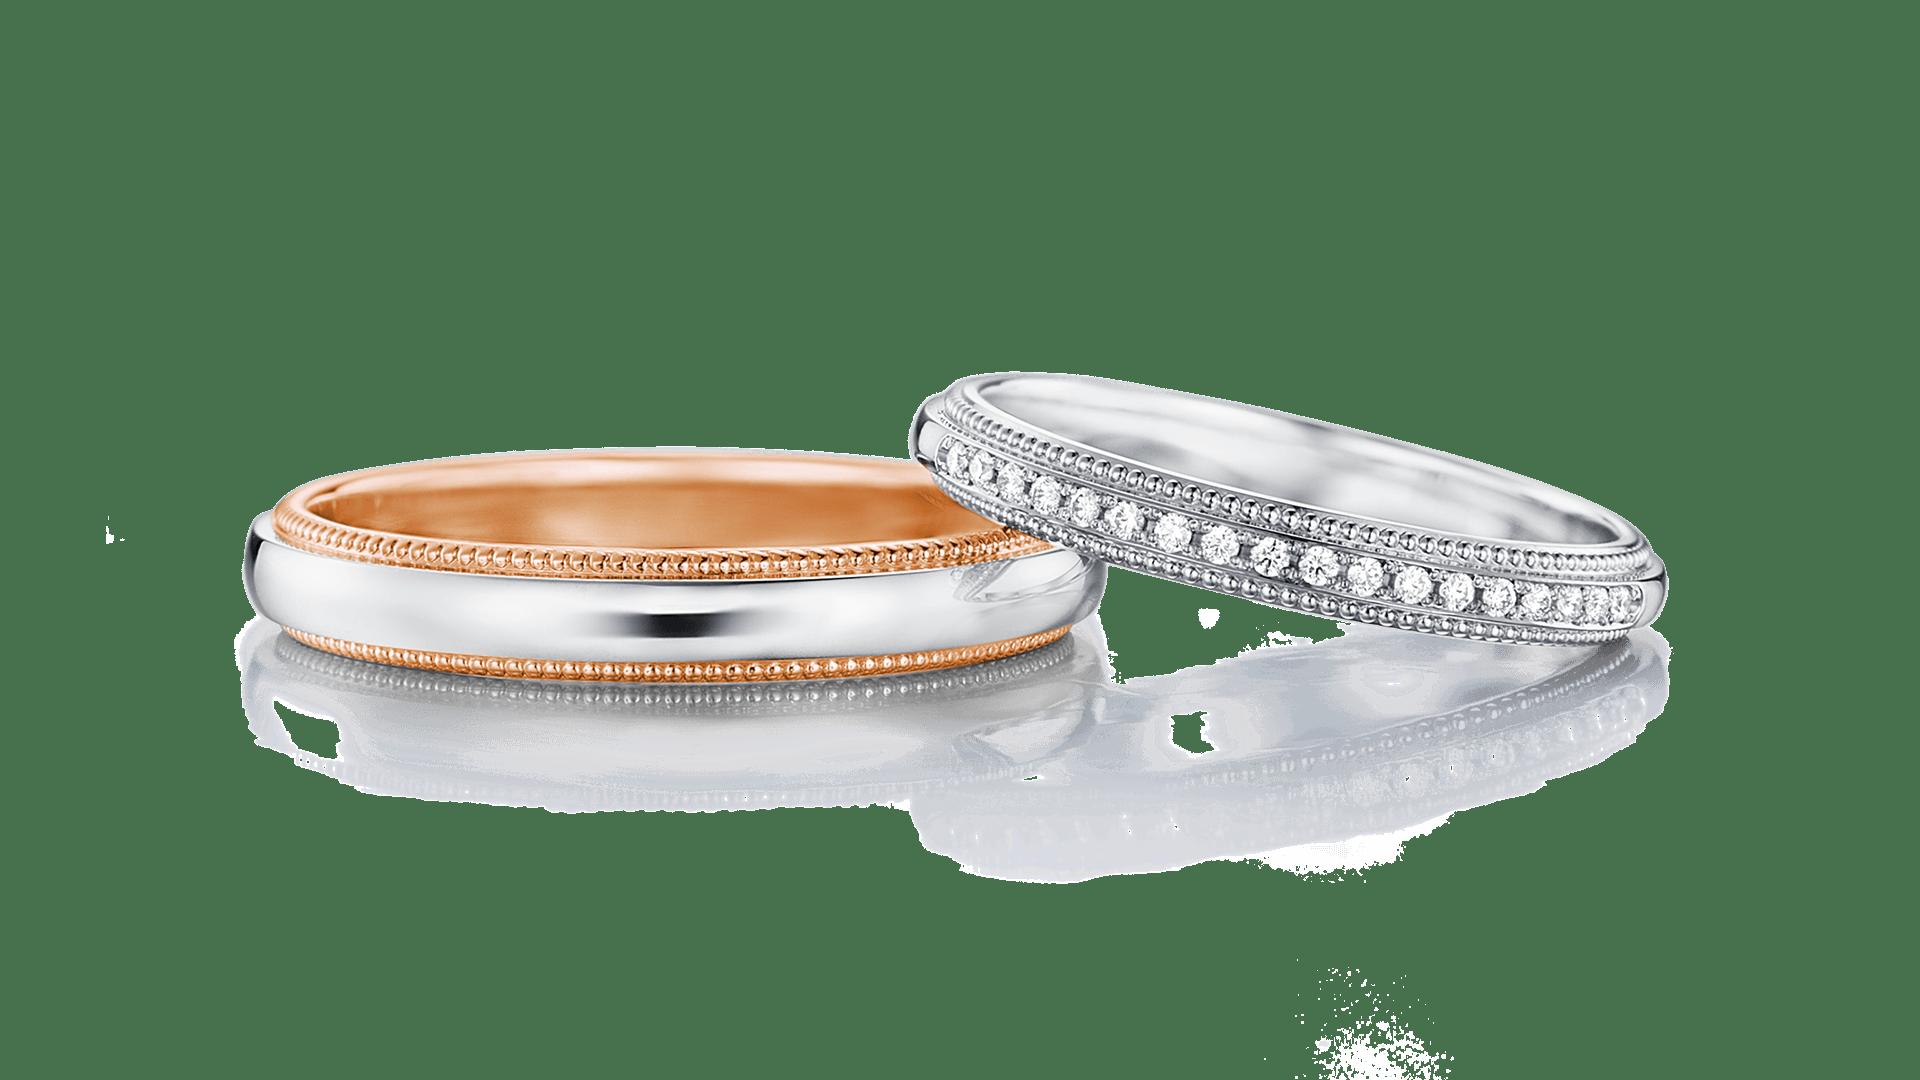 helios DR18 ヘリオスDR18 | 結婚指輪サムネイル 1